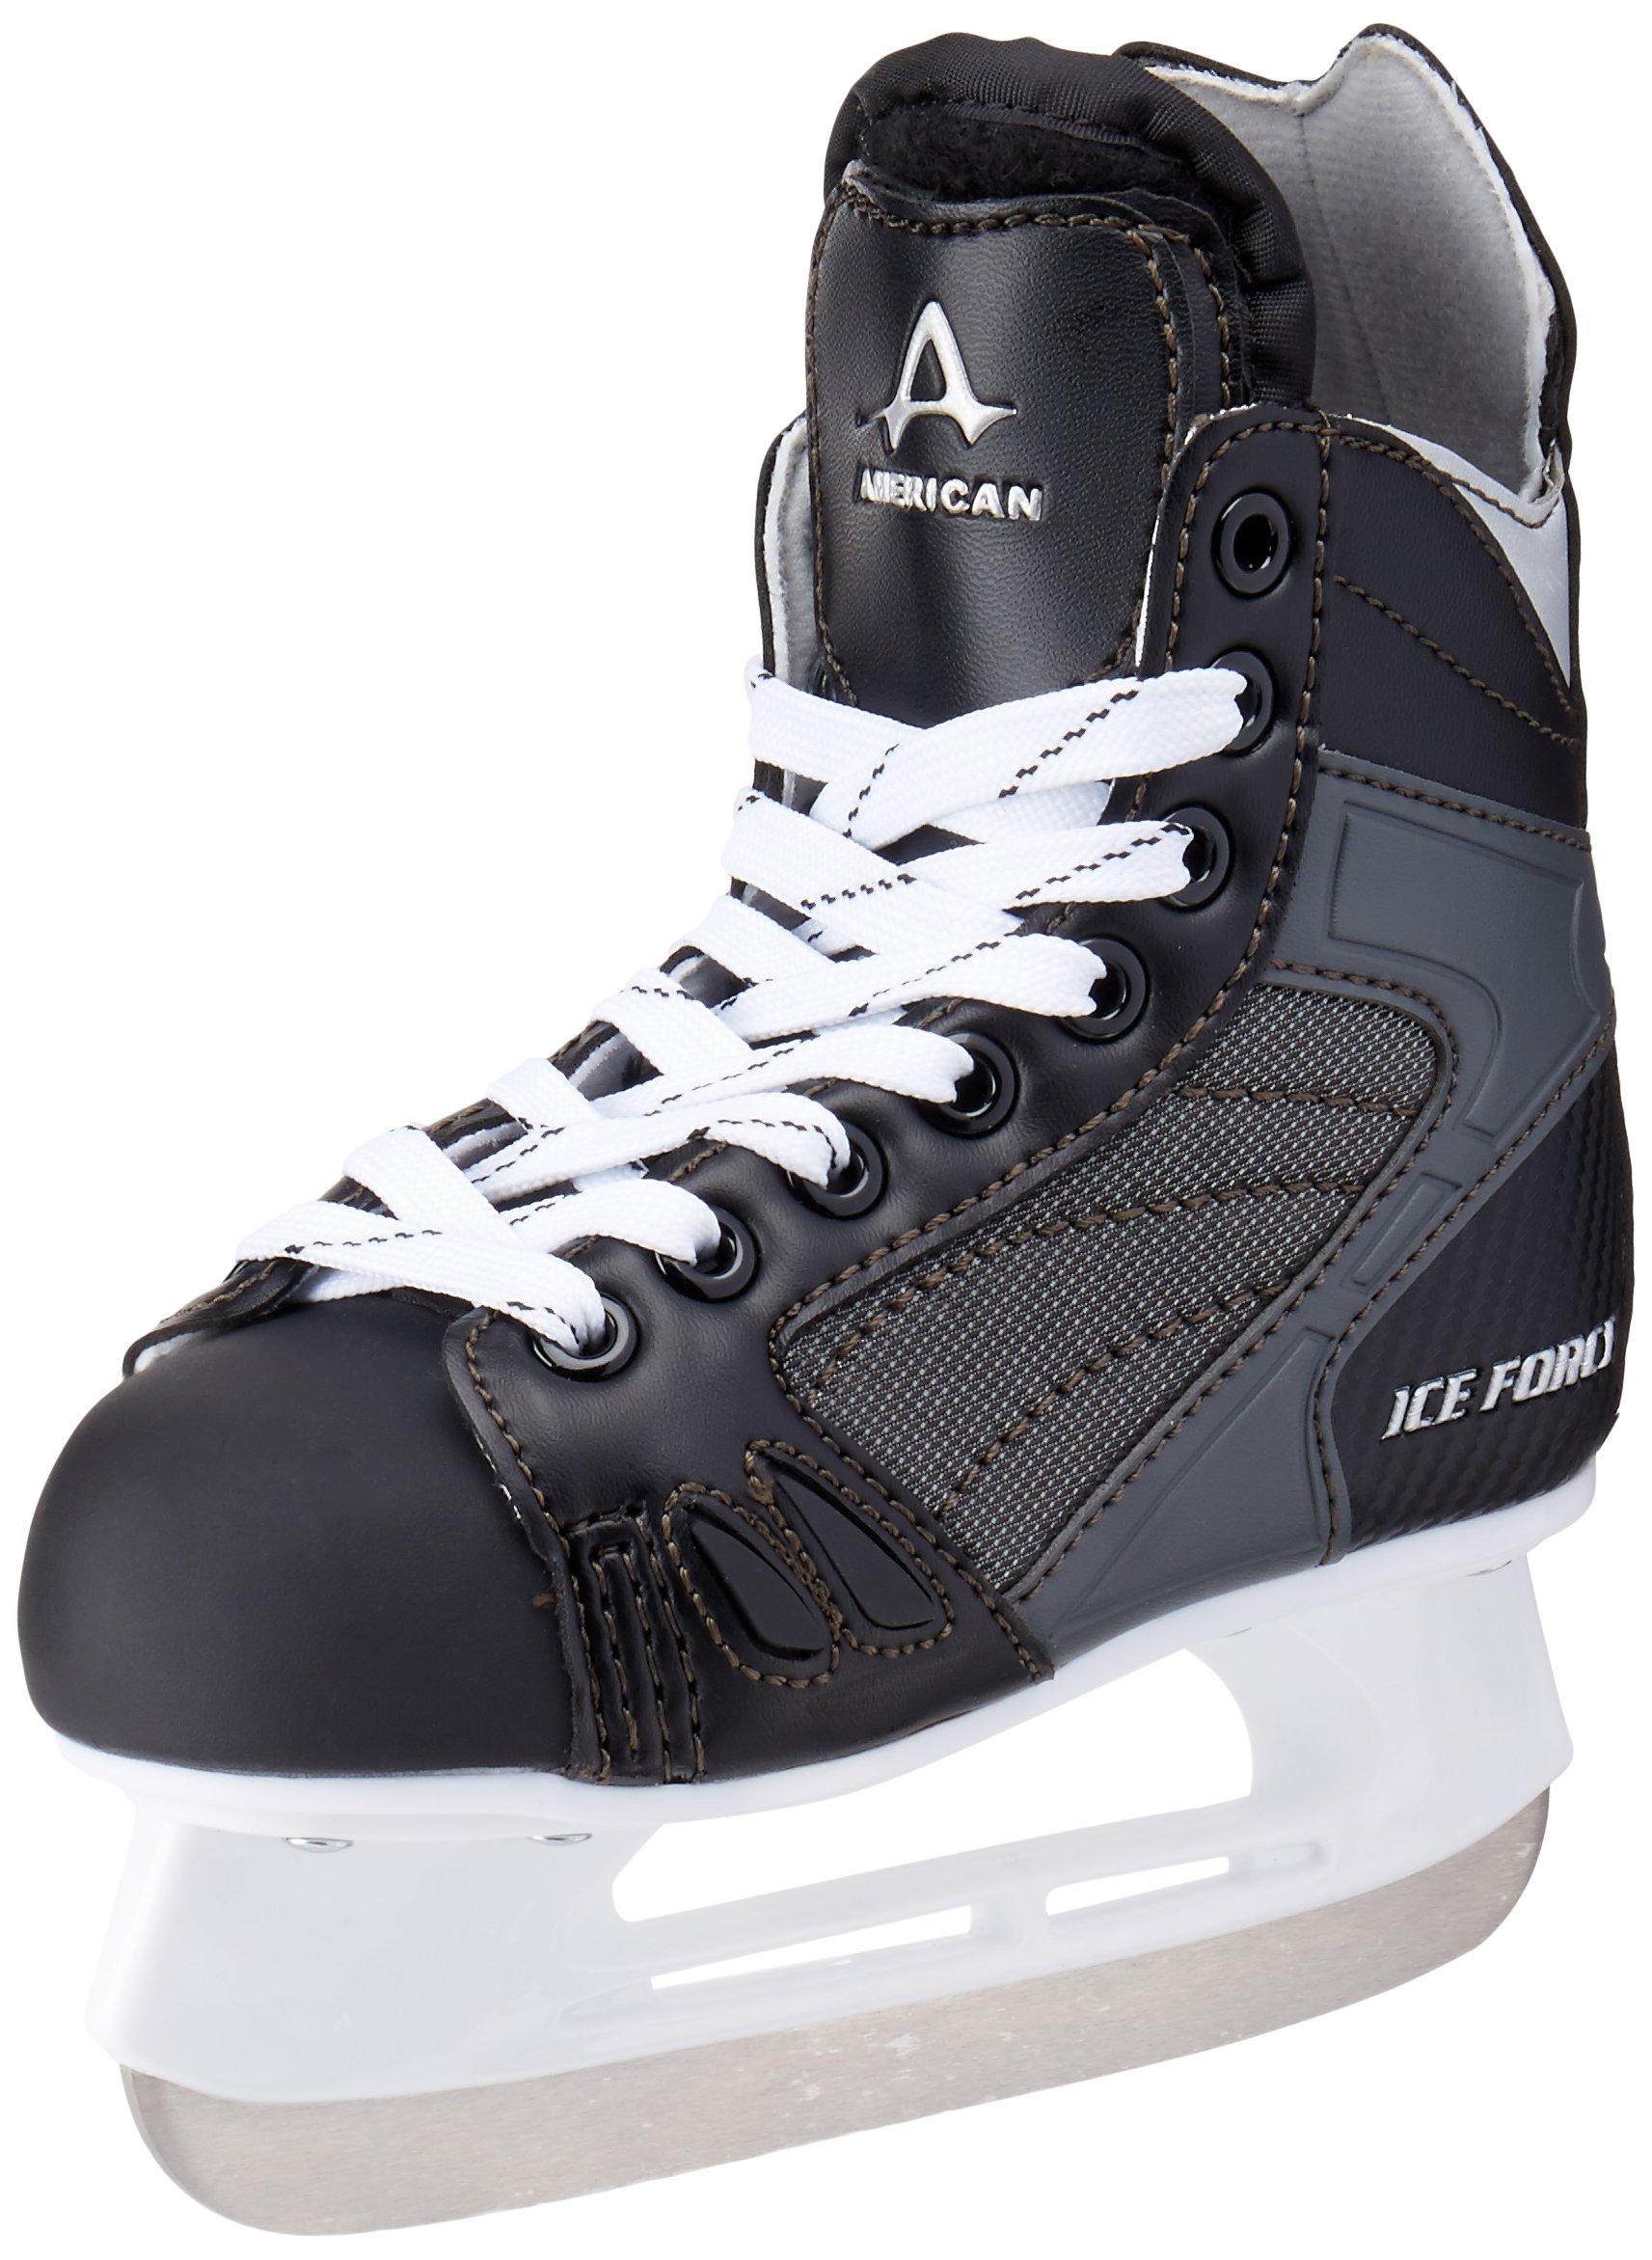 American Athletic Shoe Boy's Ice Force Hockey Skates, Black, 11 Y by American Athletic